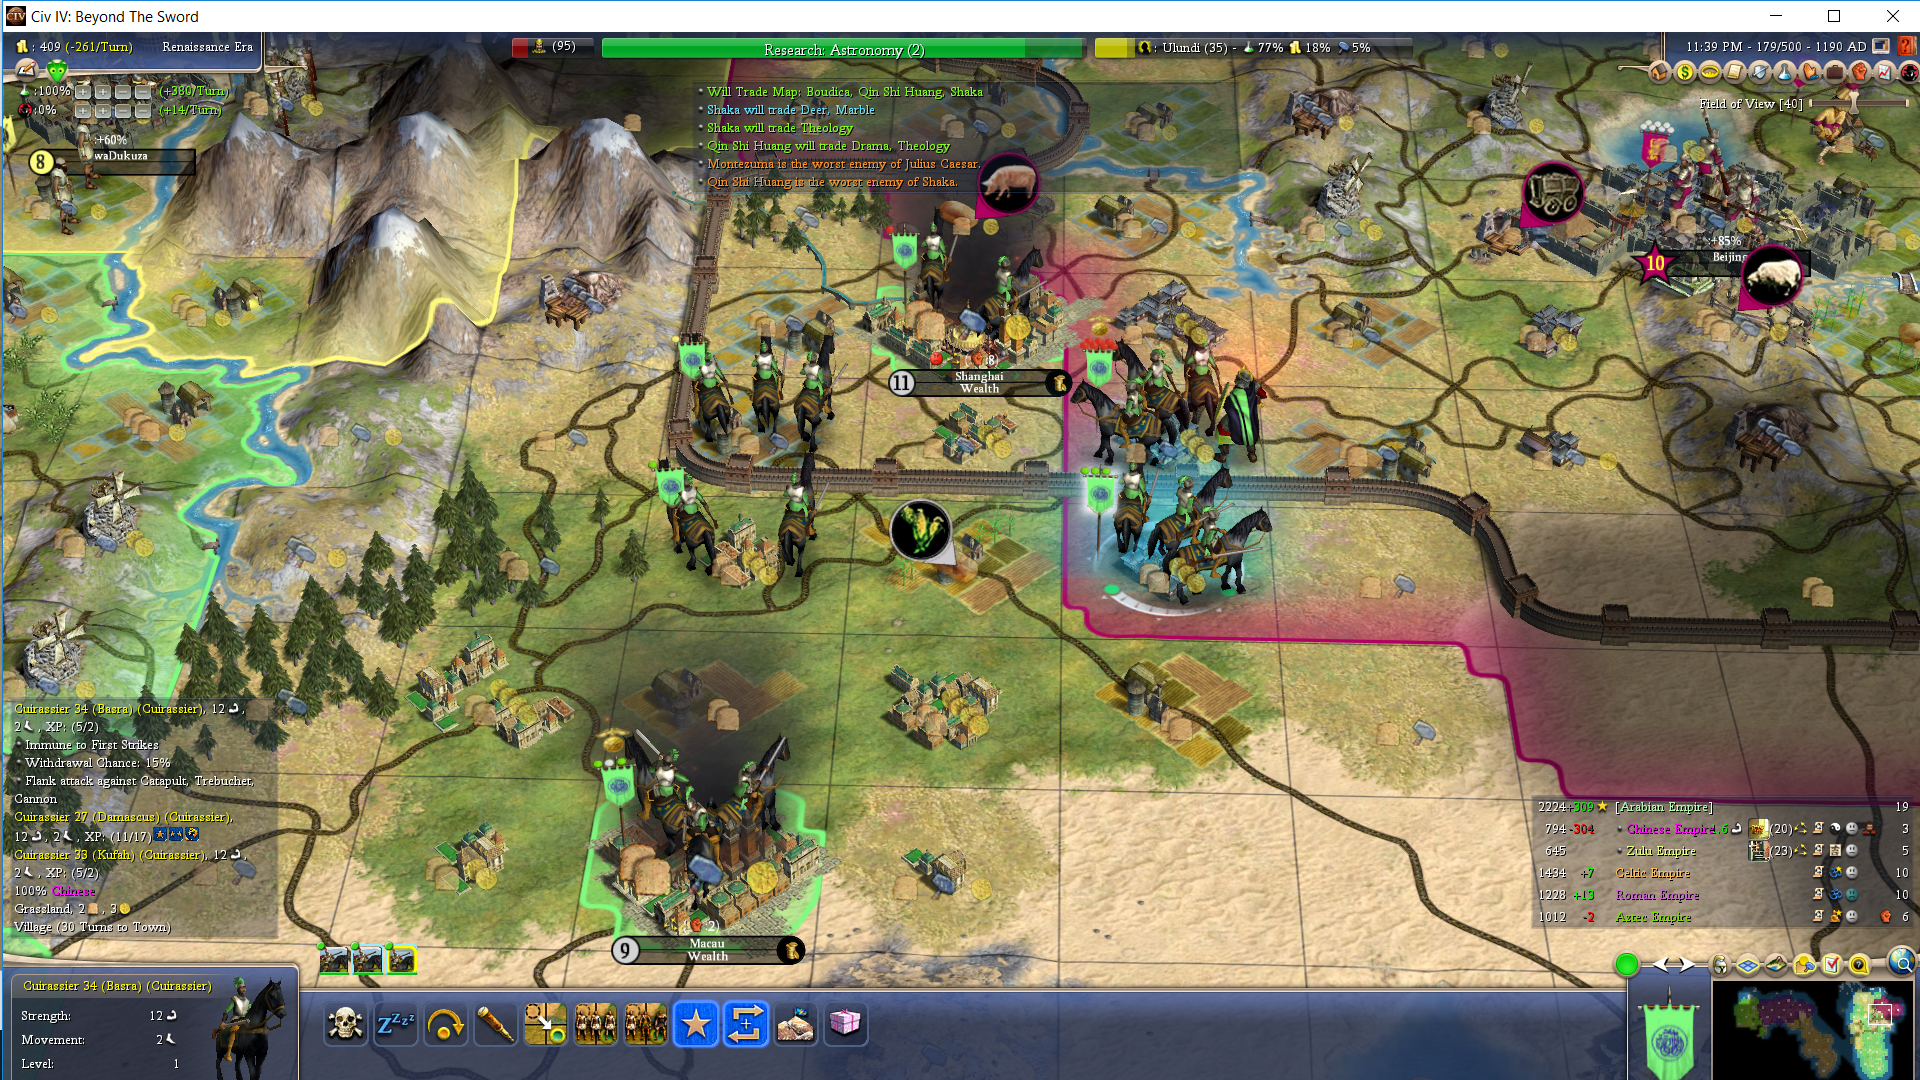 Screenshot (11208).png